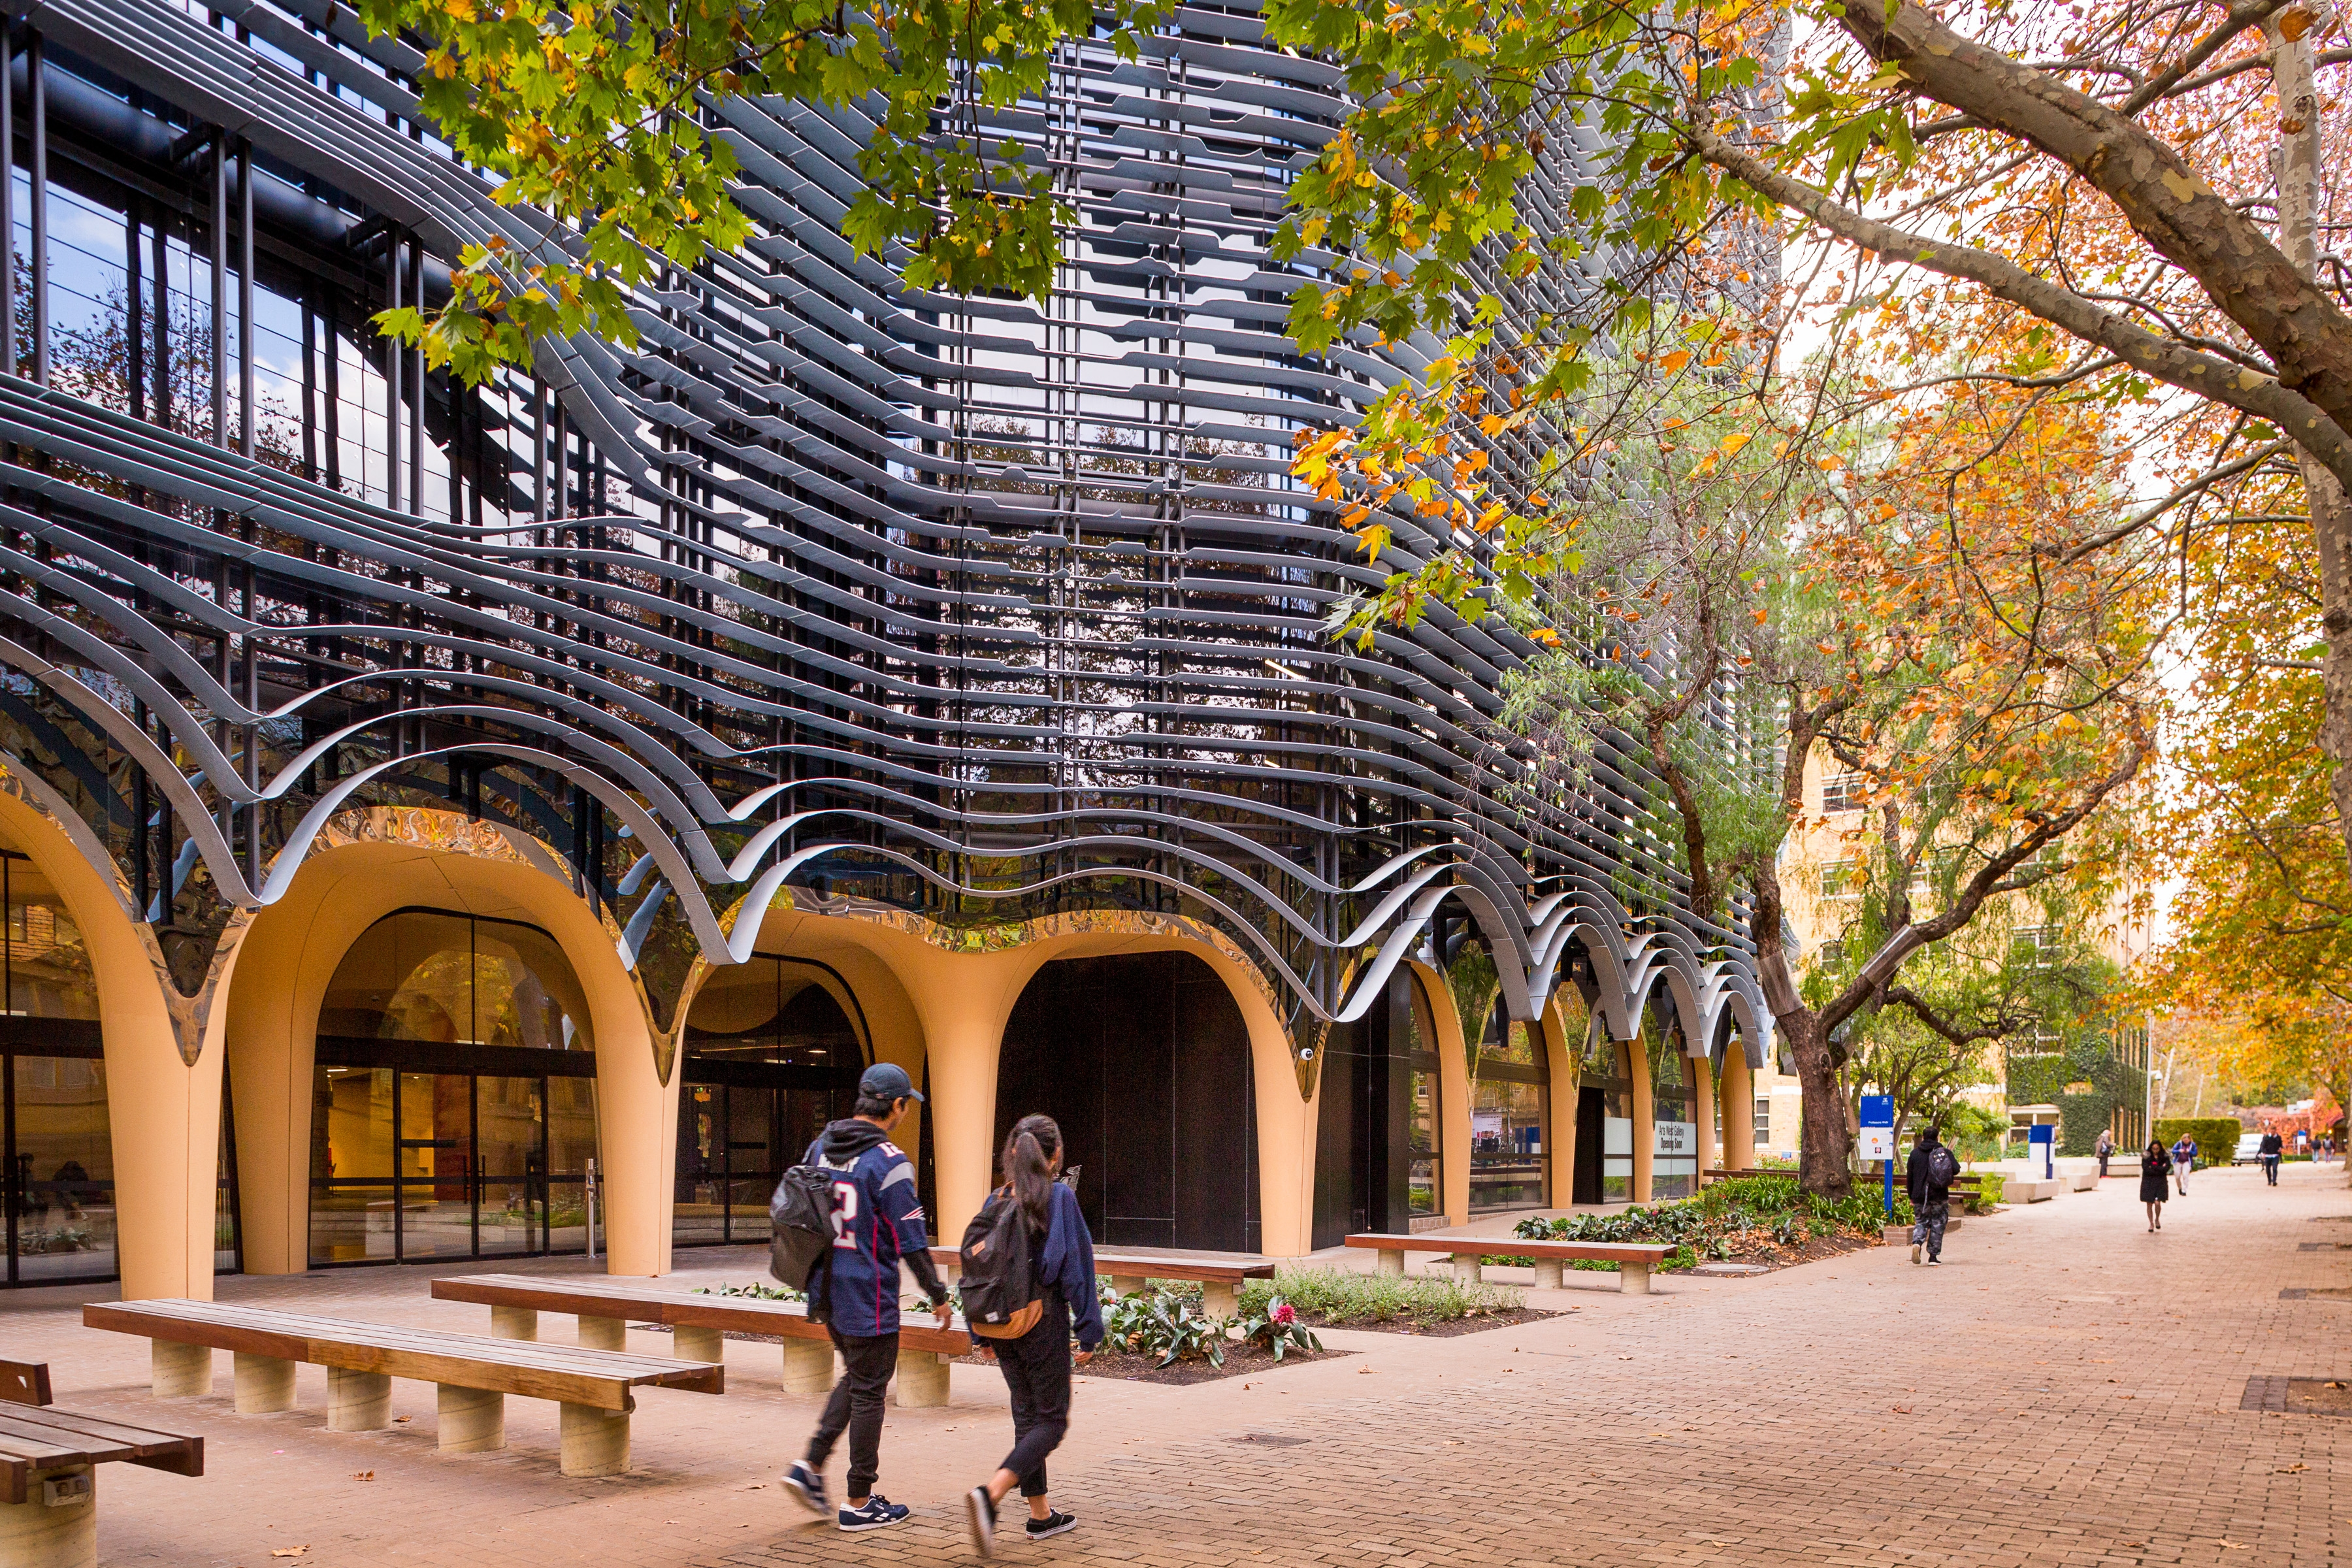 Most beautiful universities in Australia - University of Melbourne